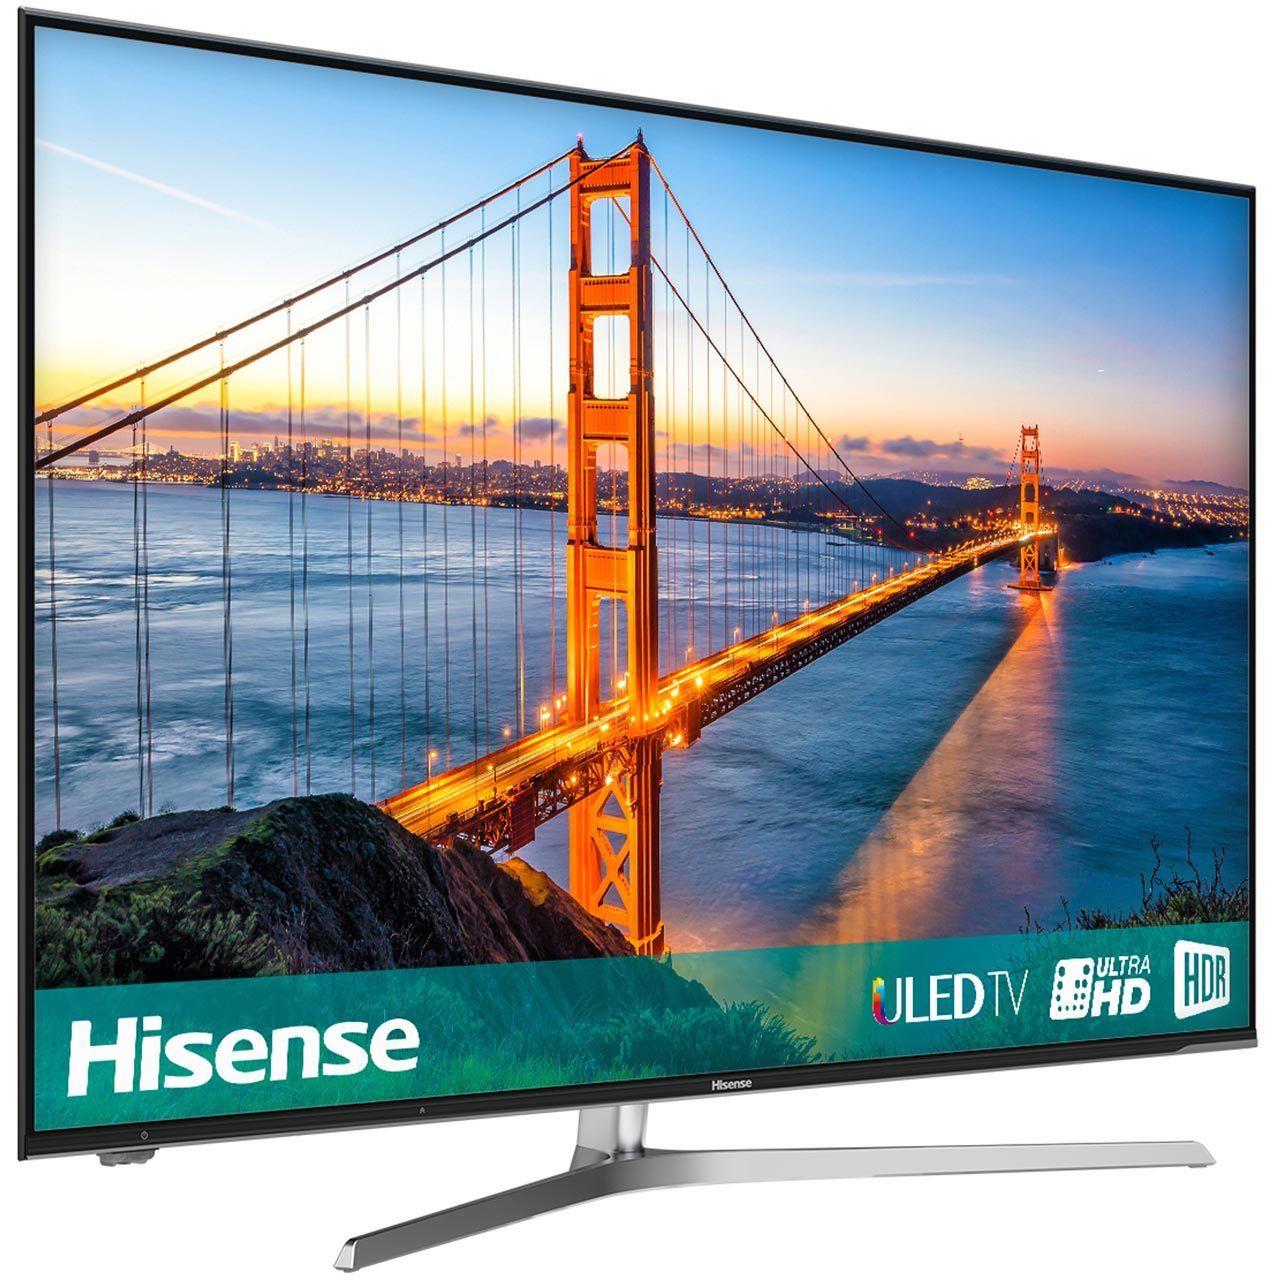 Hisense H50U7AUK U7A 50 Inch 4K Ultra HD Smart LED TV 4 HDMI £404.10 / 55'' £499 w/code @ AO Ebay